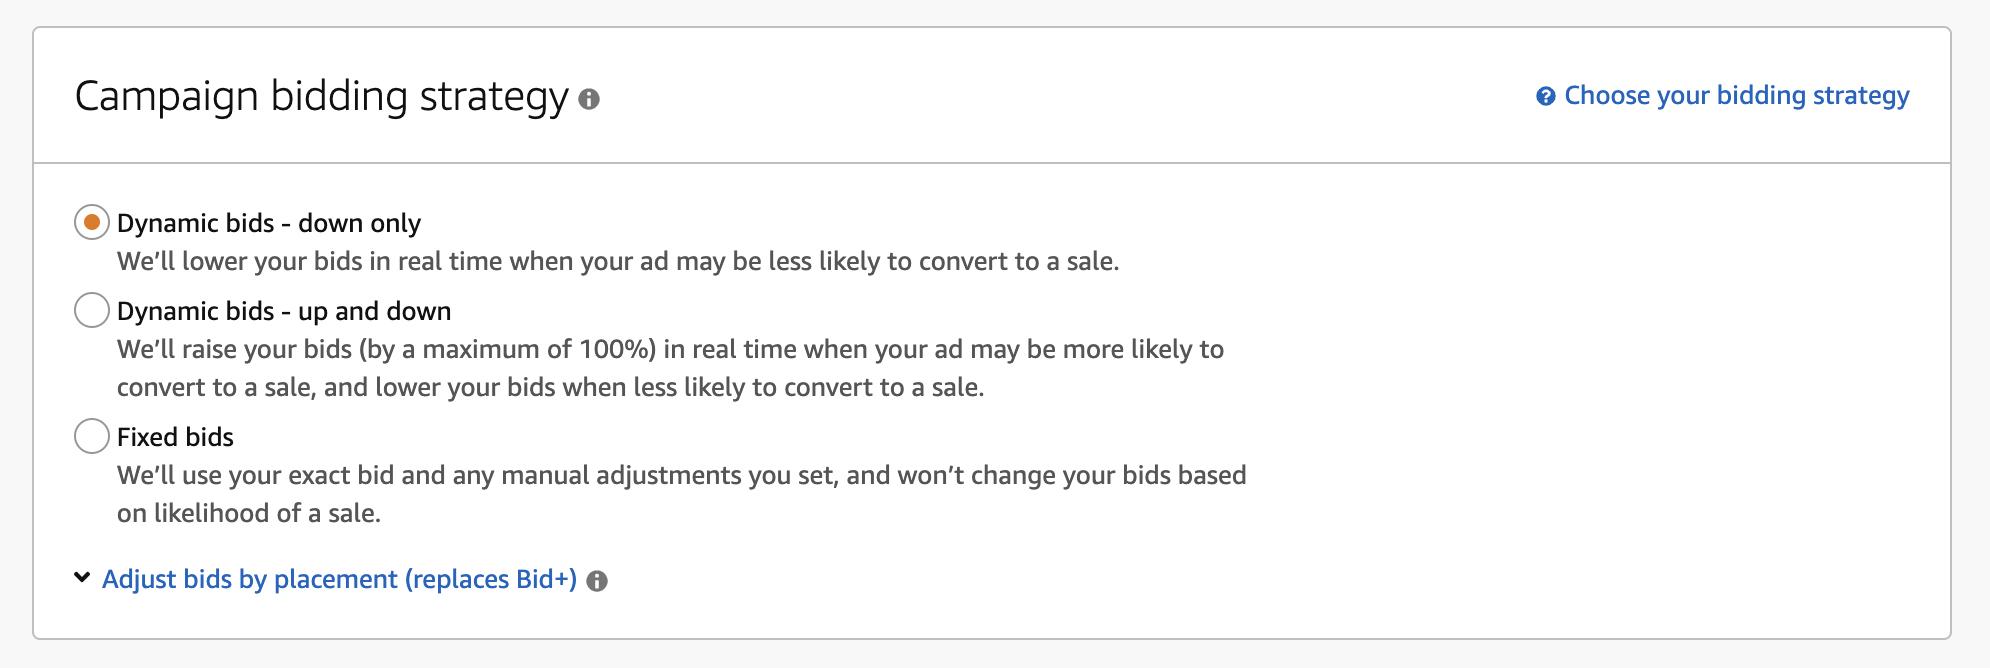 Choose dynamic bids down, dynamic bids up or down, or fixed bids